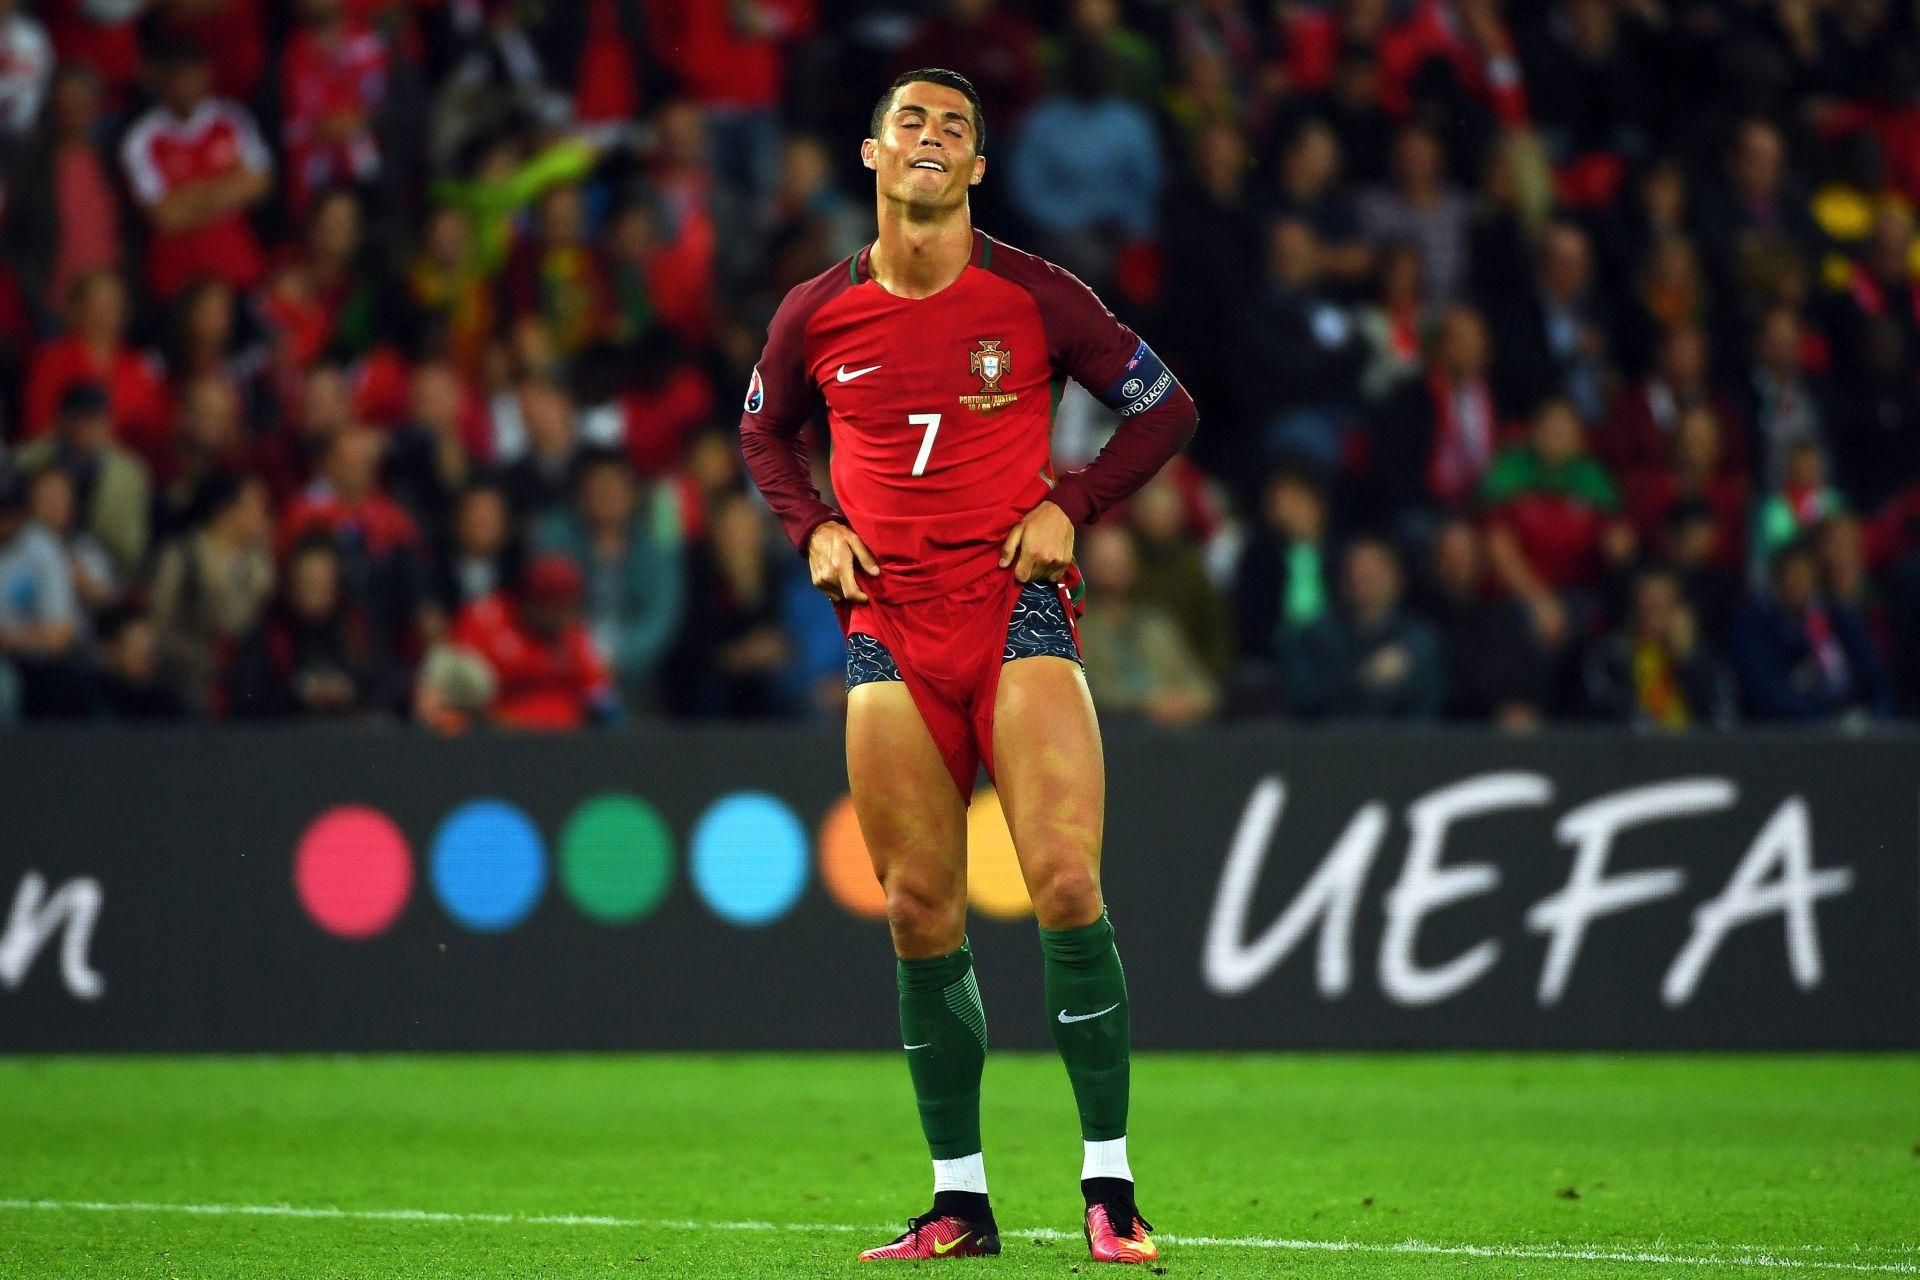 CRISTIANO RONALDO Deset udaraca, nula golova, promašeni penal i jedan selfie